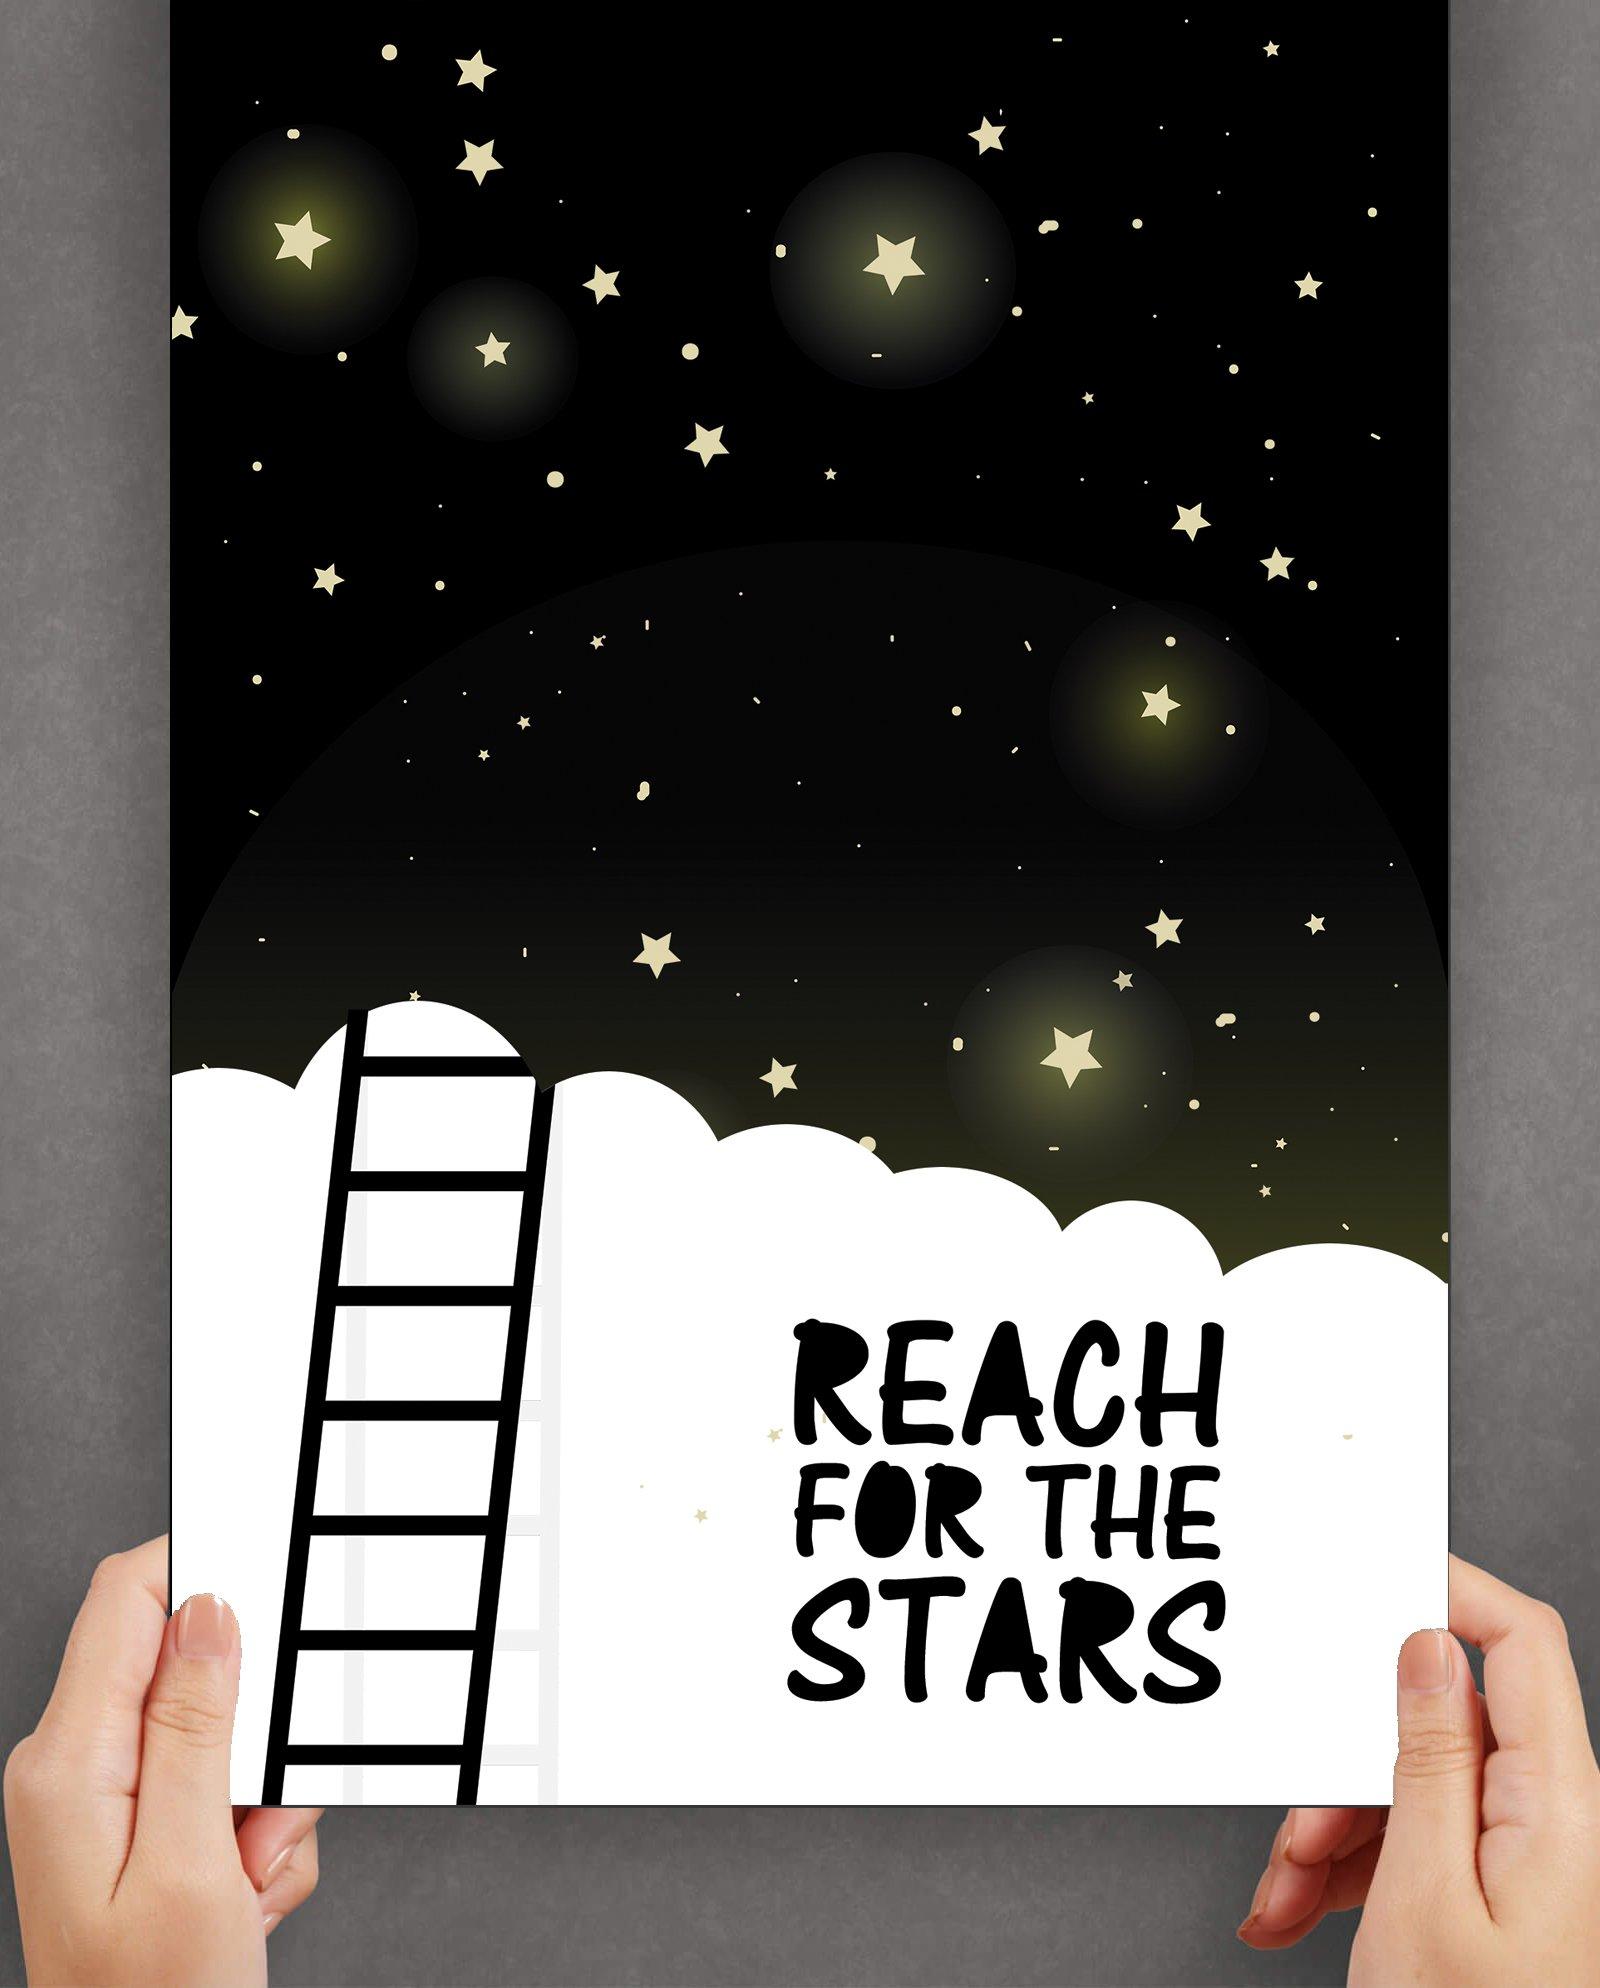 stjerne-gave-plakat-2